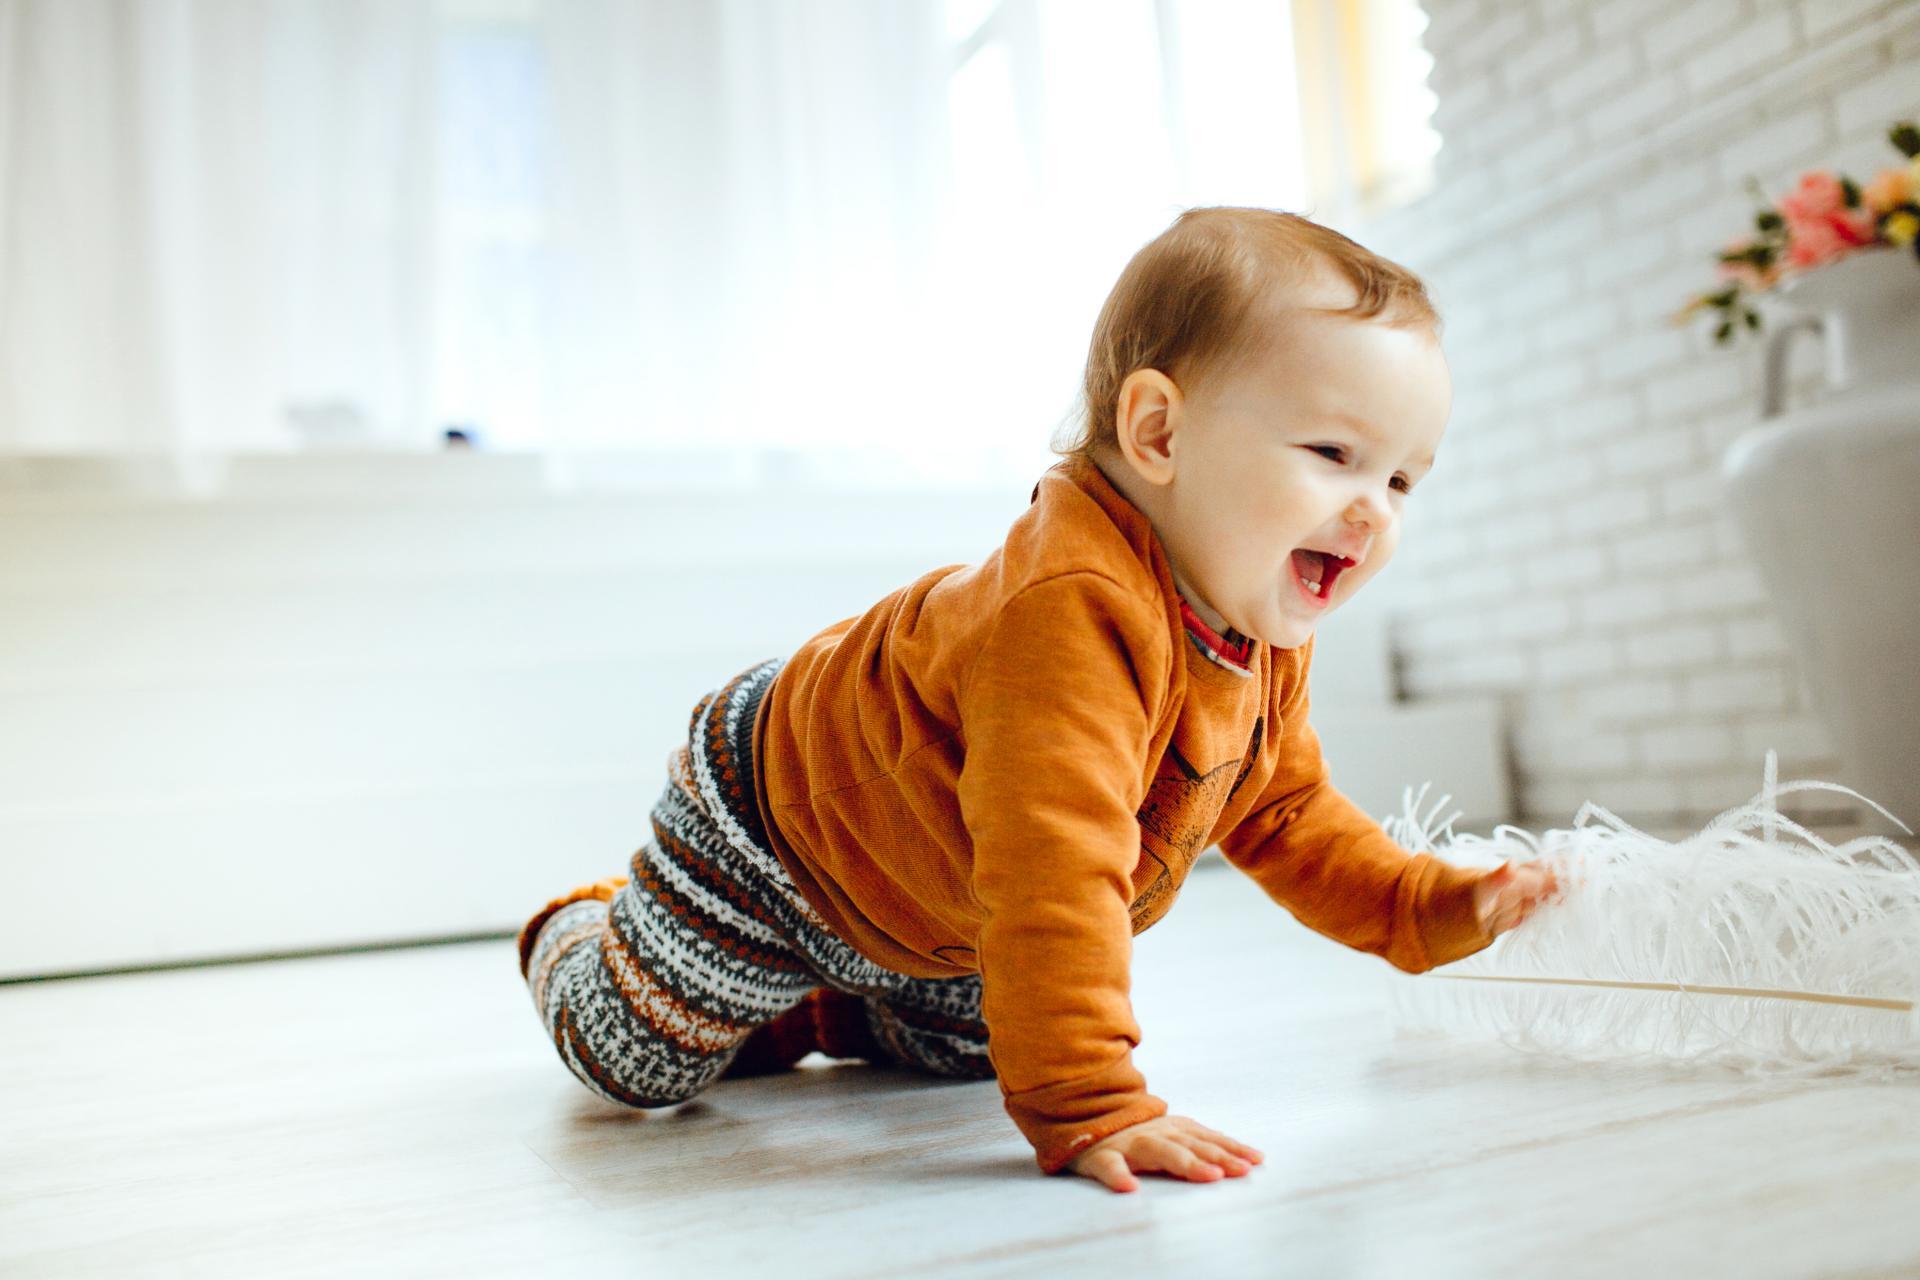 Happy child orange sweater plays with feather floor